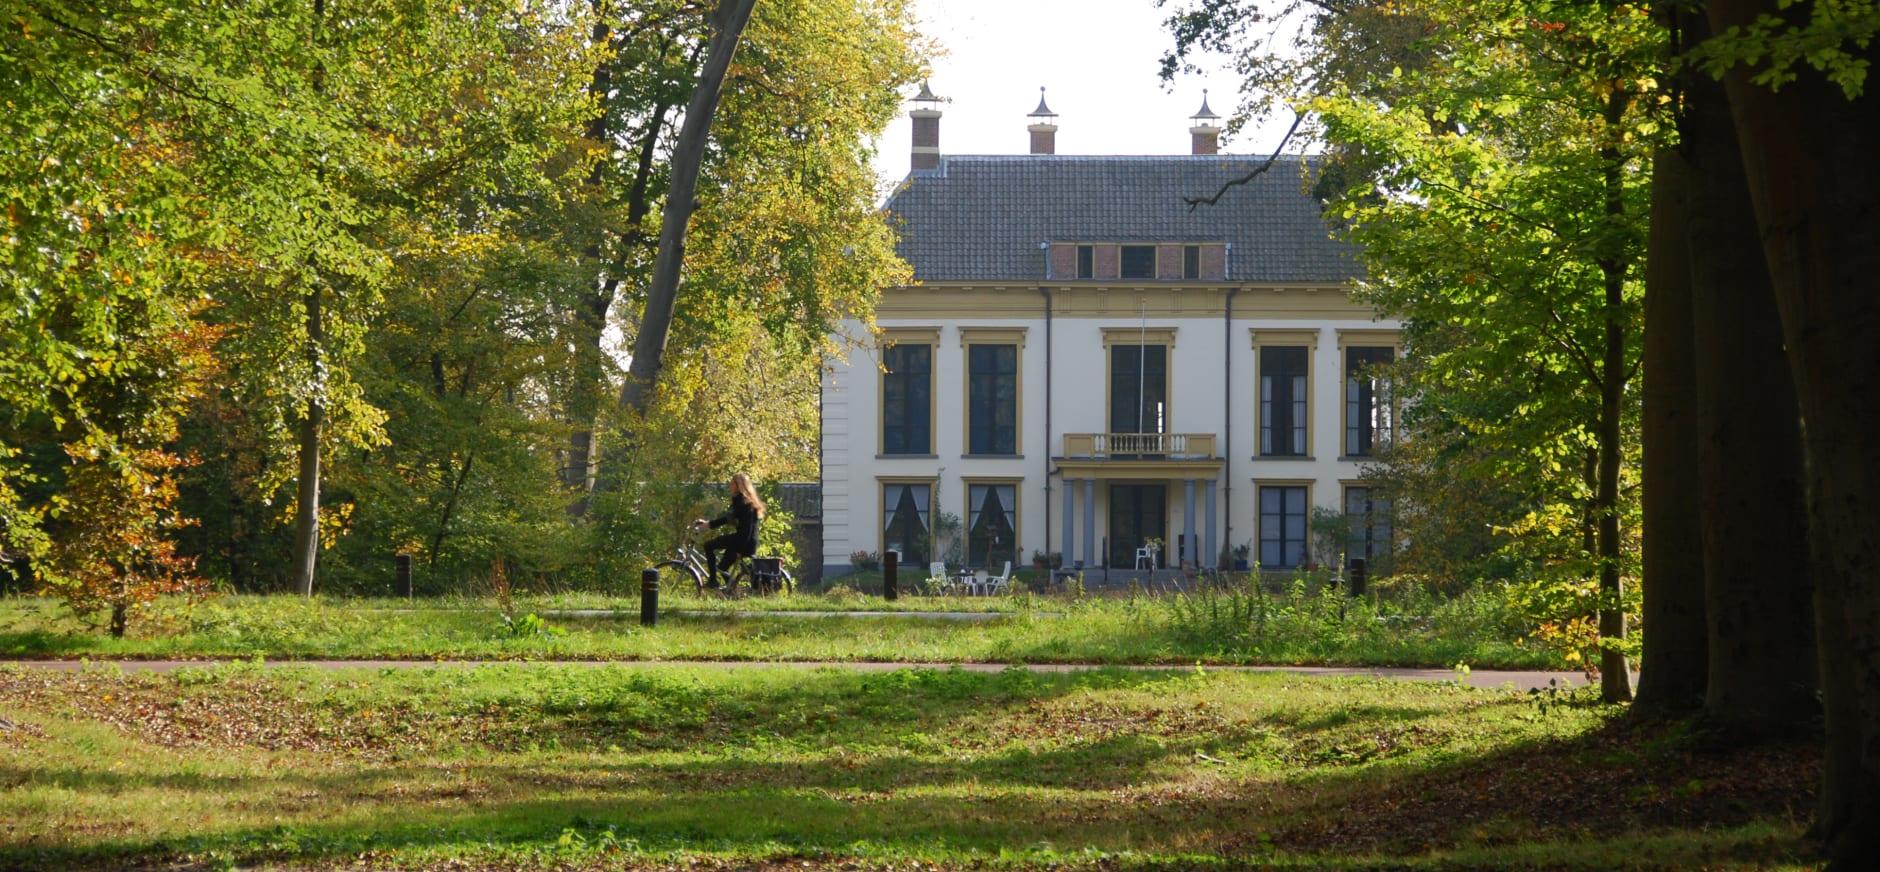 Landgoed Nijenburg